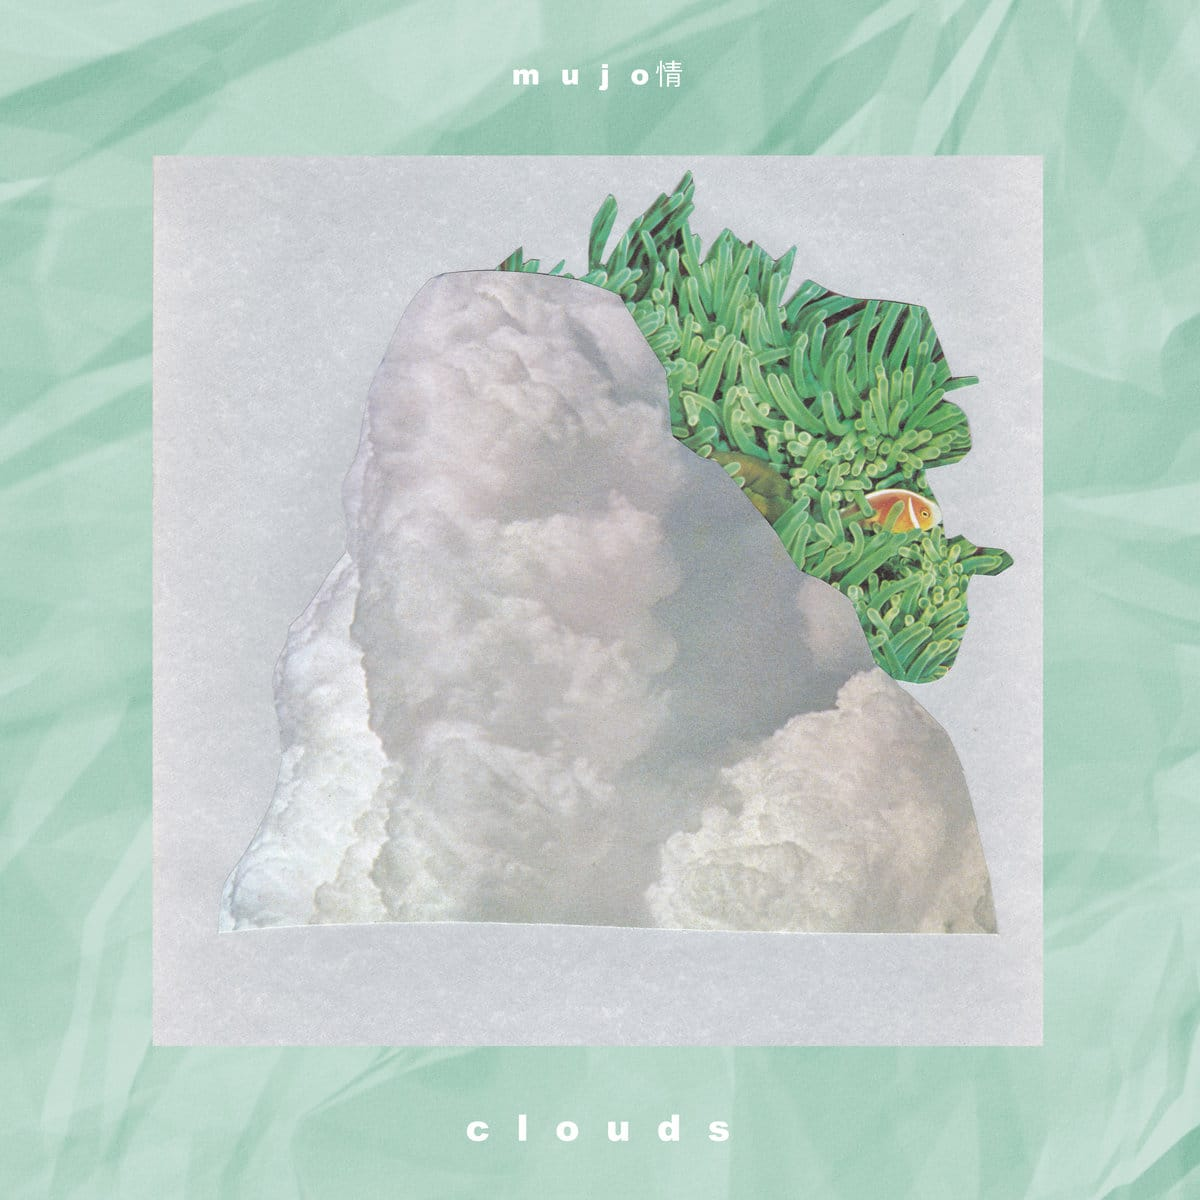 Mujo情 - Clouds